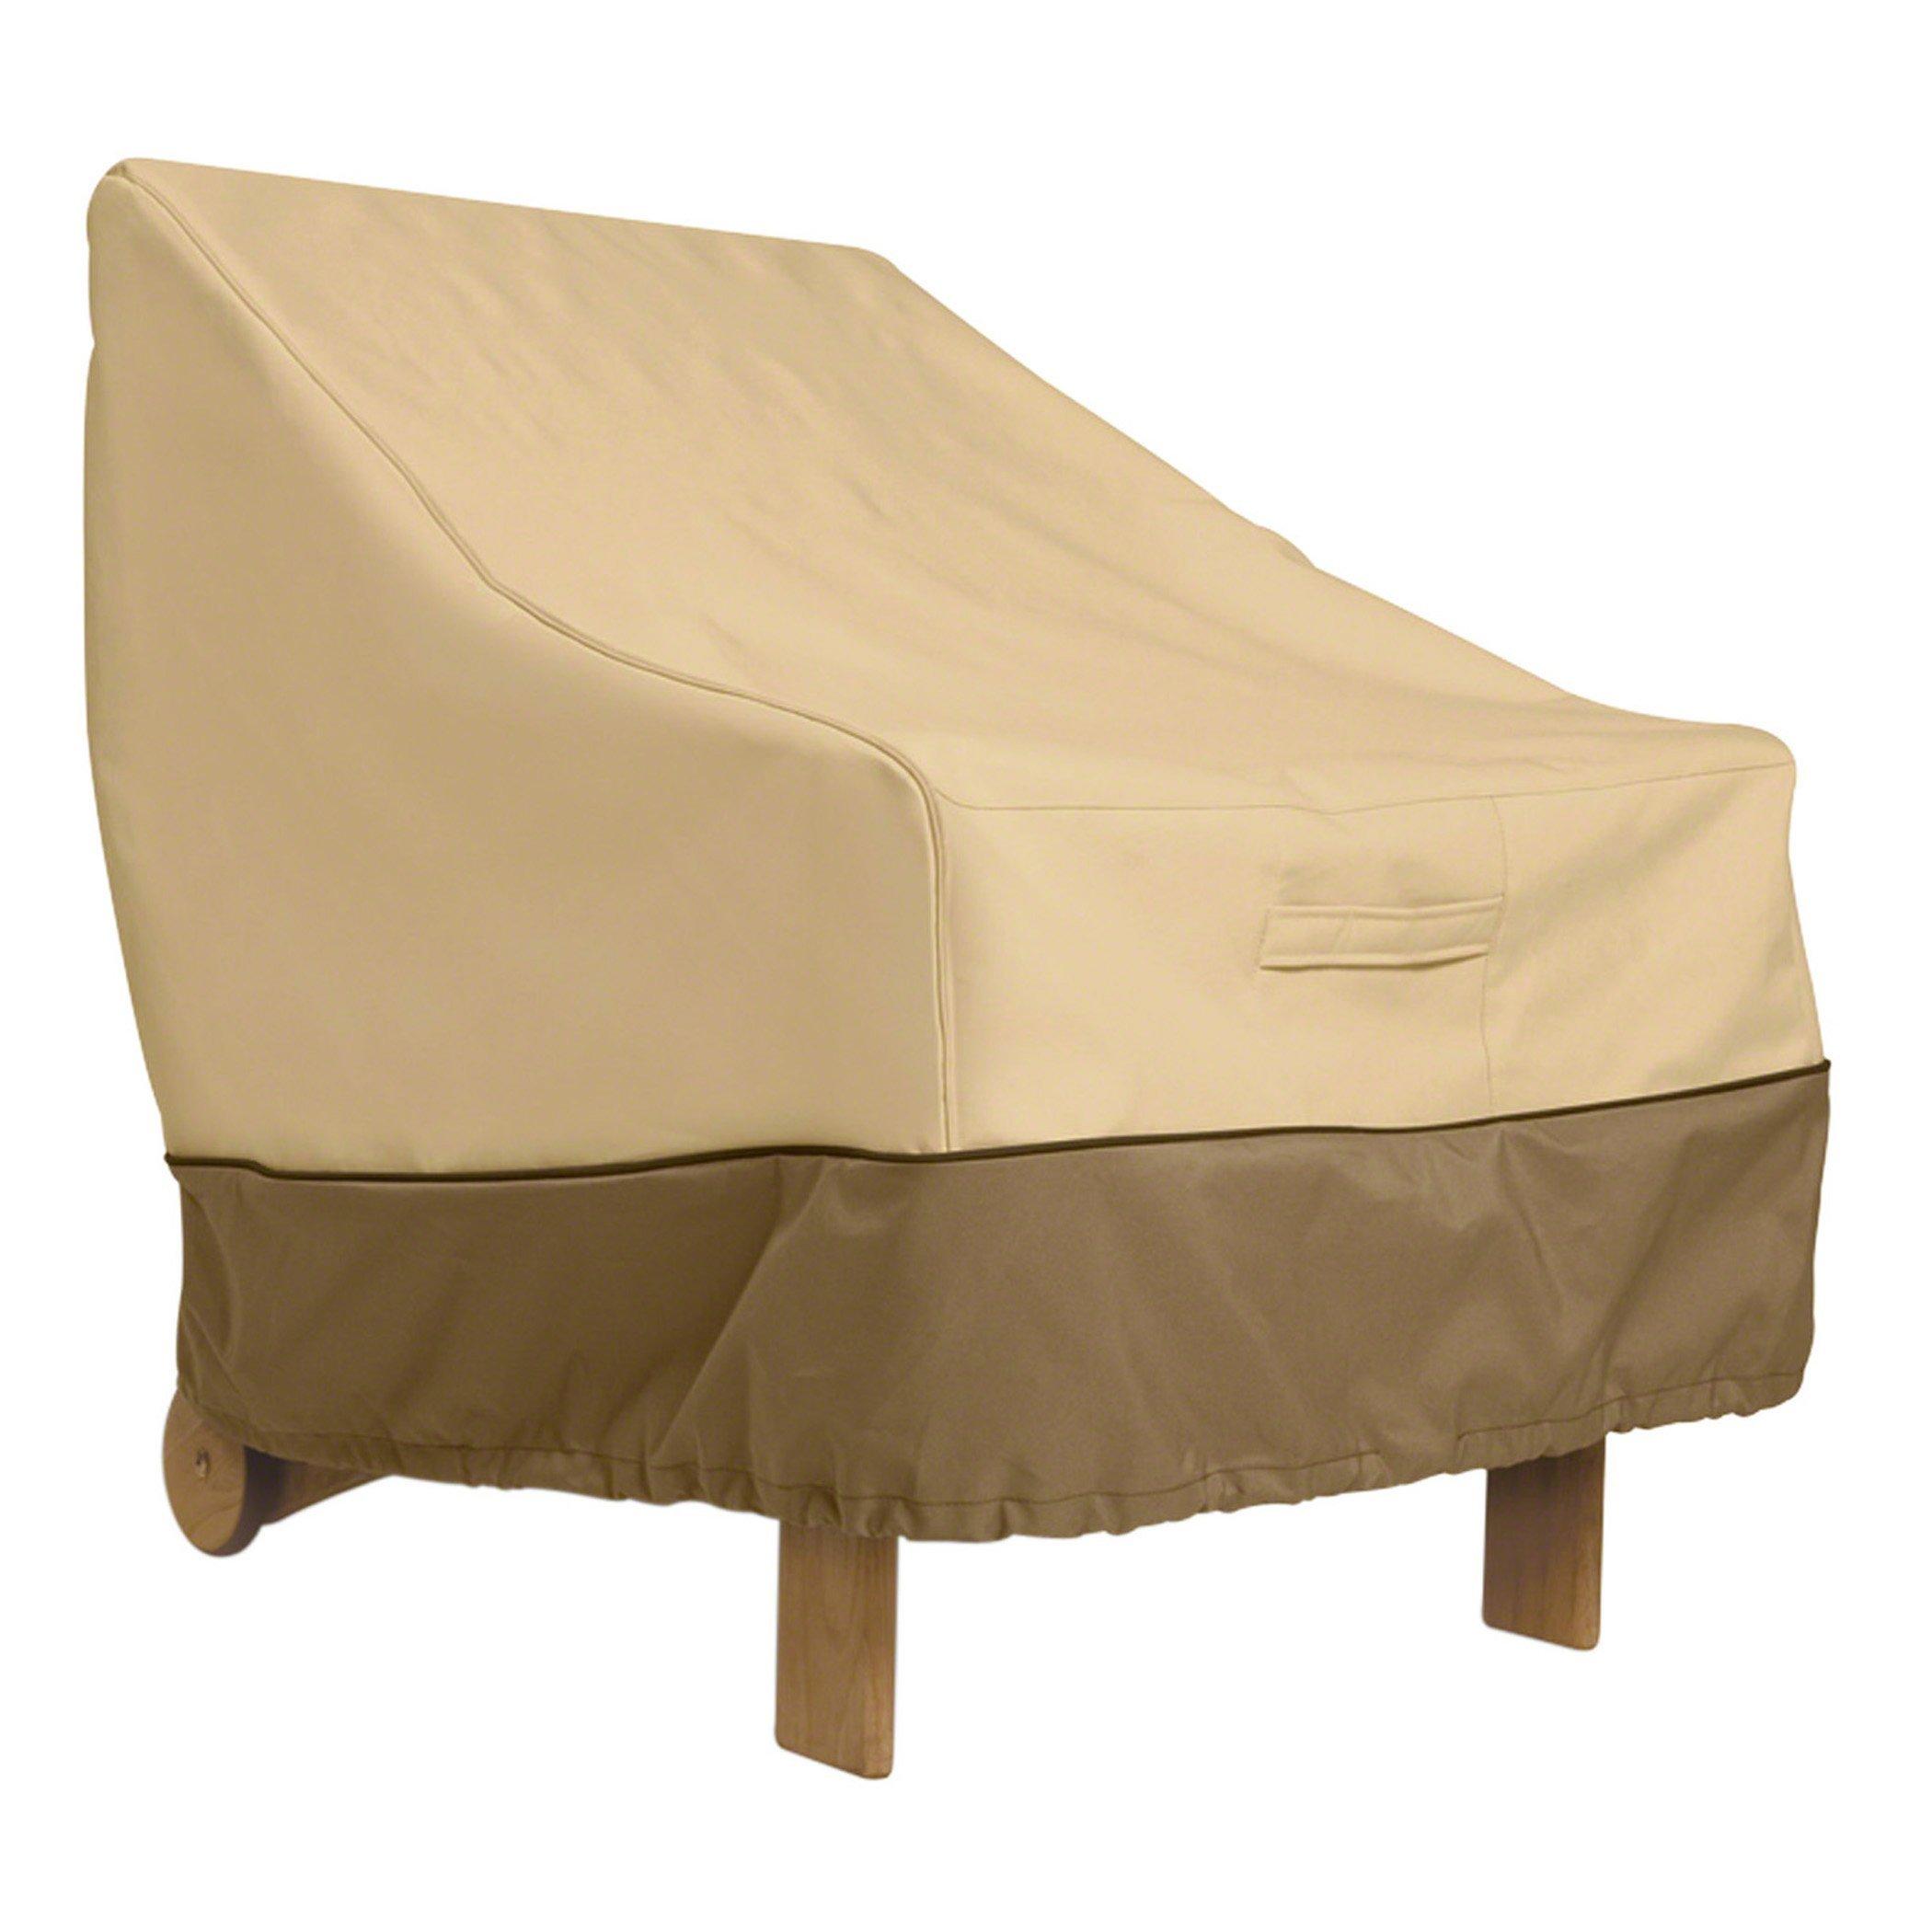 Classic Accessories Veranda Patio Lounge Standard Chair Cover (28x26x26)